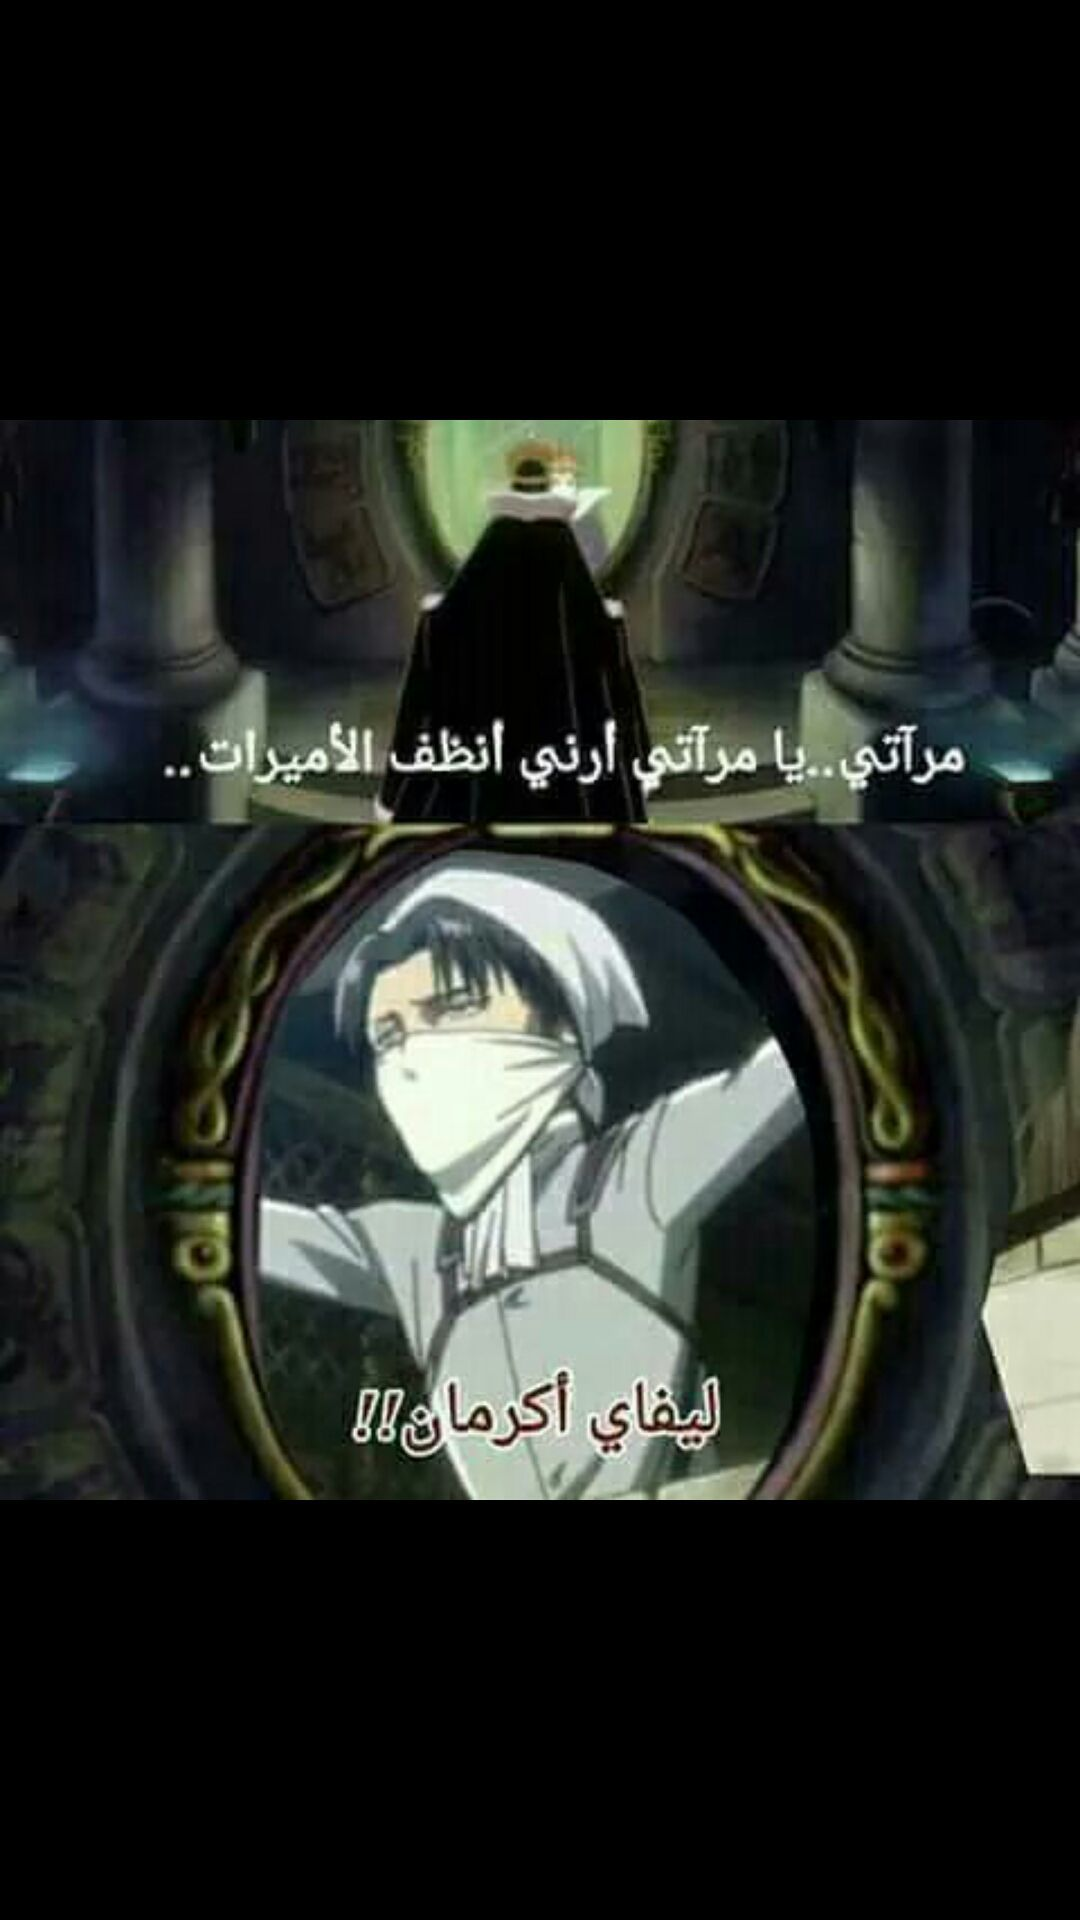 يوميات ضحك Anime Funny Anime Memes Funny Really Funny Memes